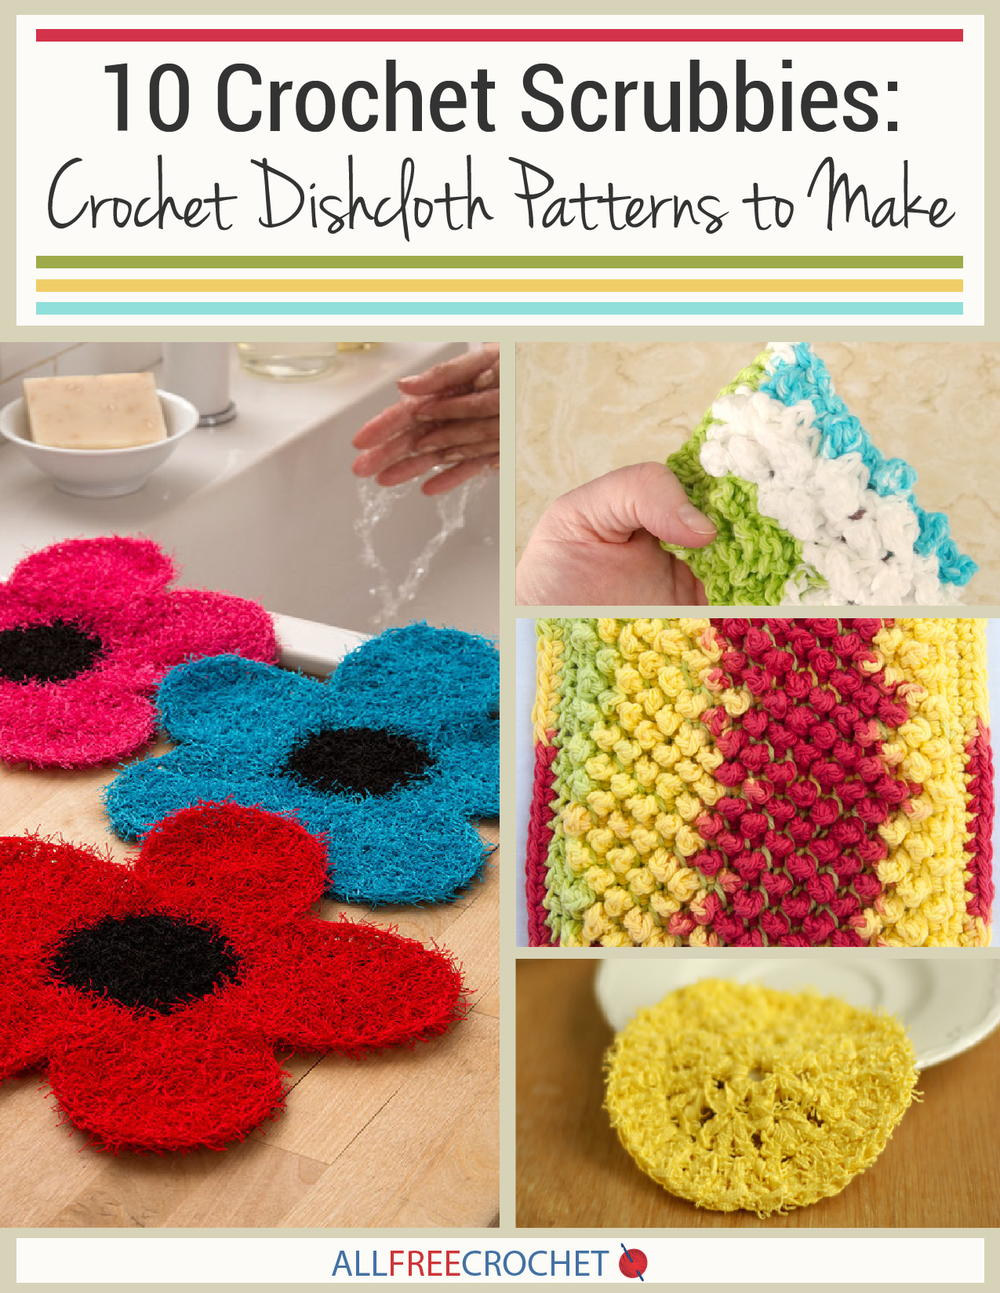 10 Crochet Scrubbies: Crochet Dishcloth Patterns to Make ...